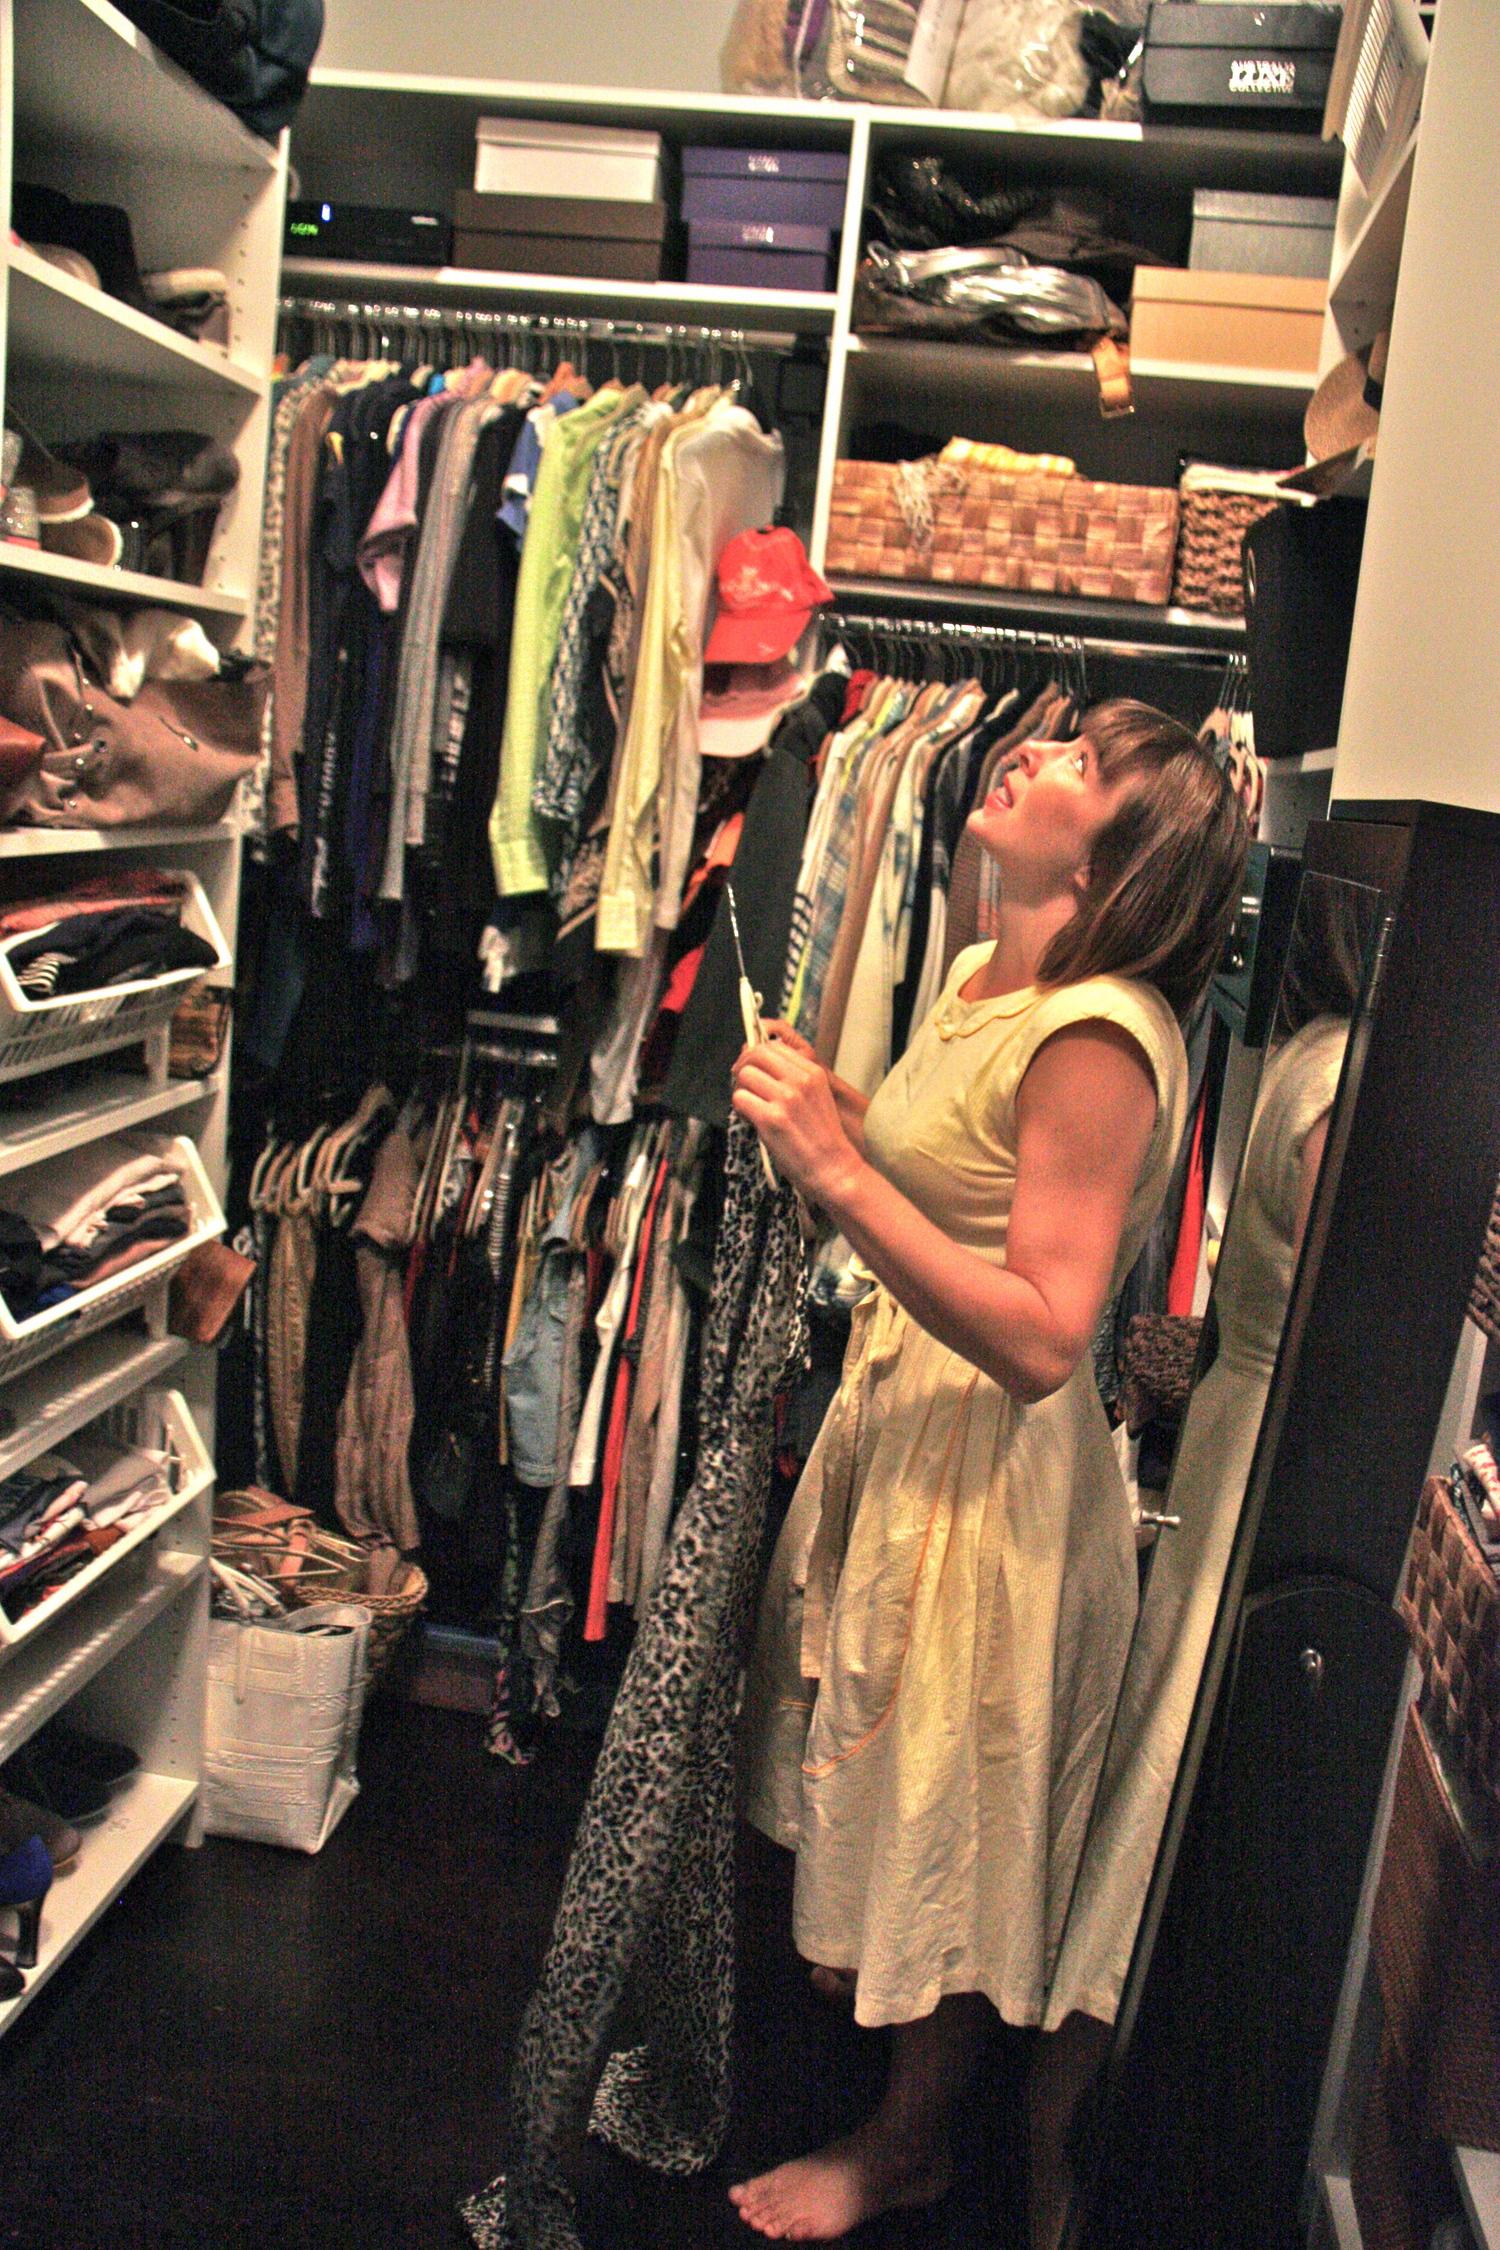 Carmen in the Closet - Carmen Adriana Top Wardrobe Stylist, Hamptons-New York City